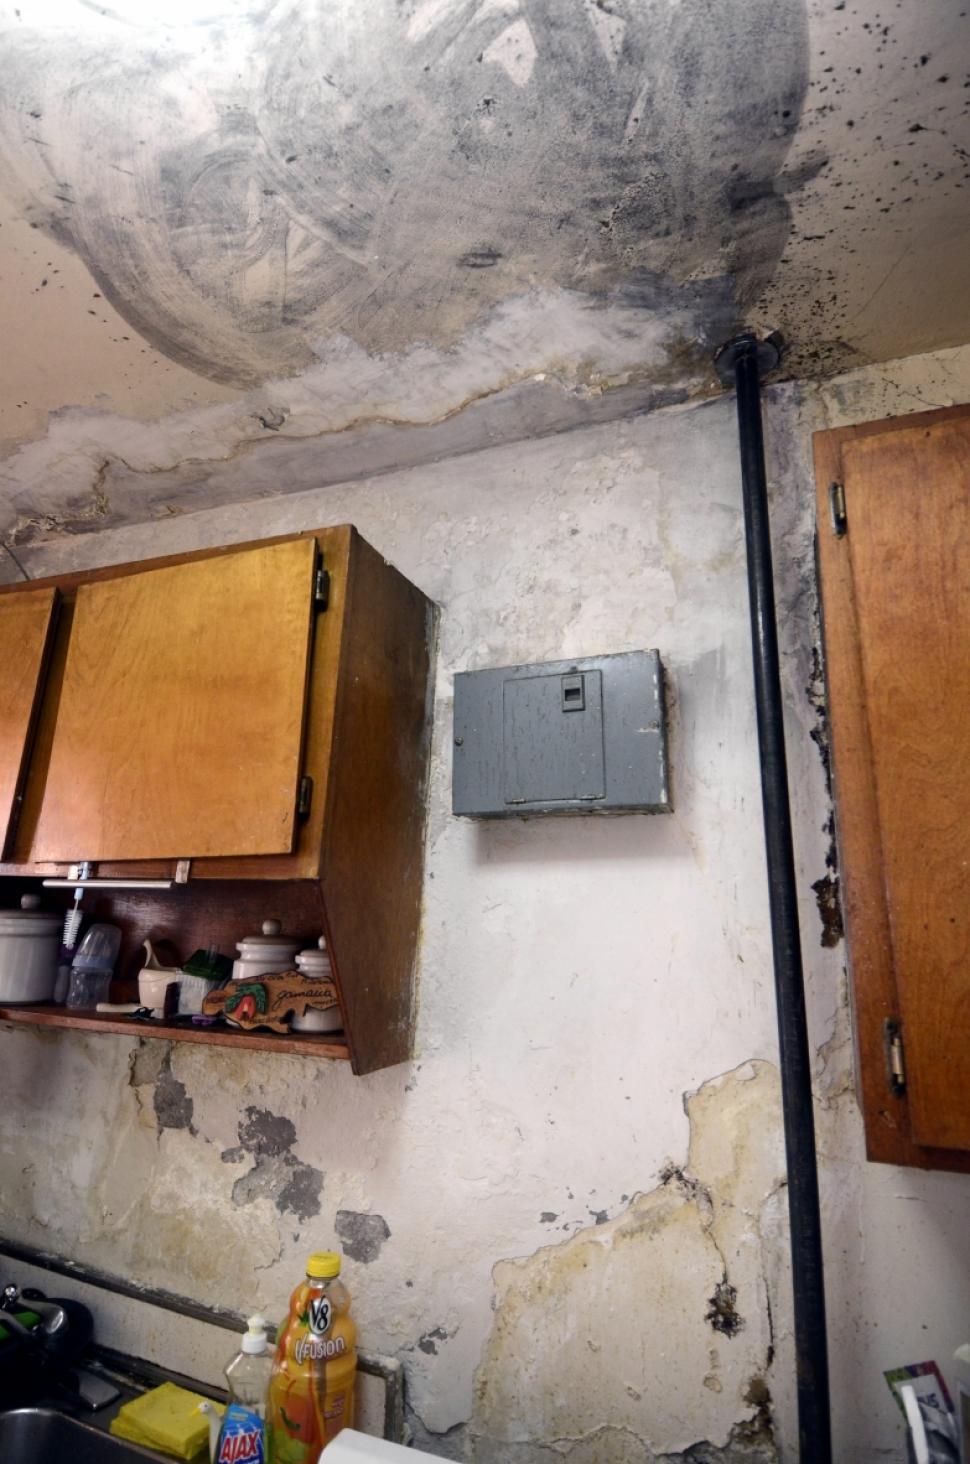 Leaking balcony waterproofing and repairs getdry for Balcony repairs